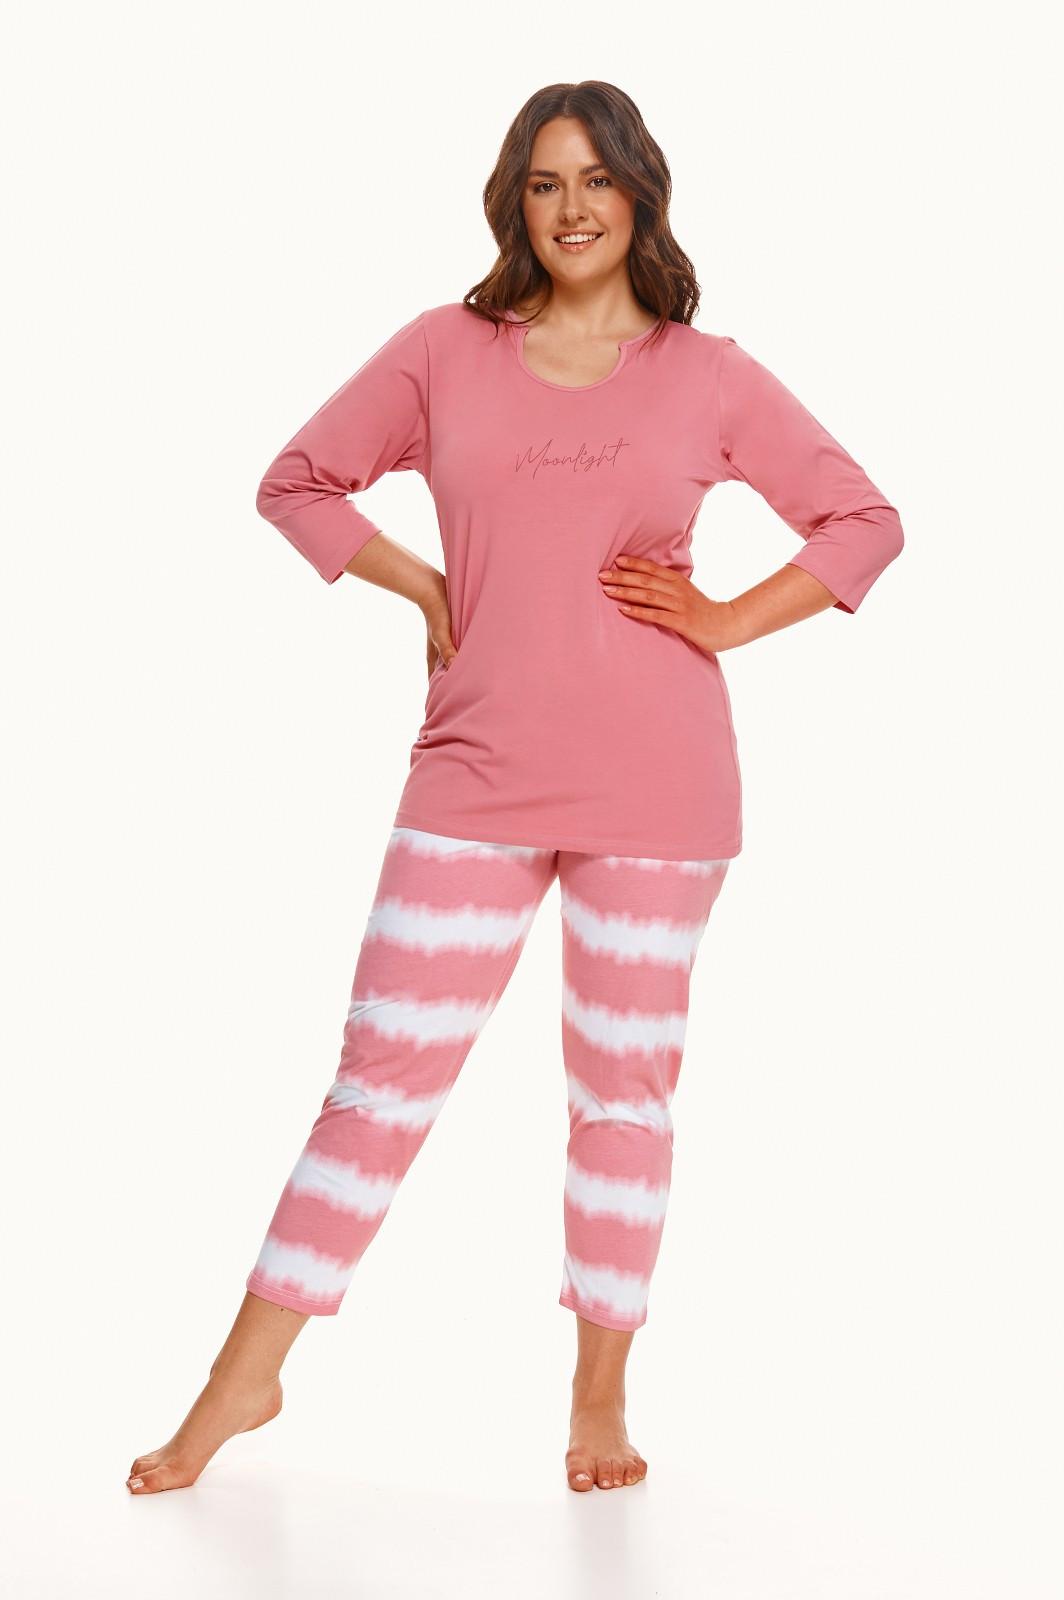 Dámske pyžamo Taro Carla 2606 3/4 2XL-3XL Z'22 růžová xxl